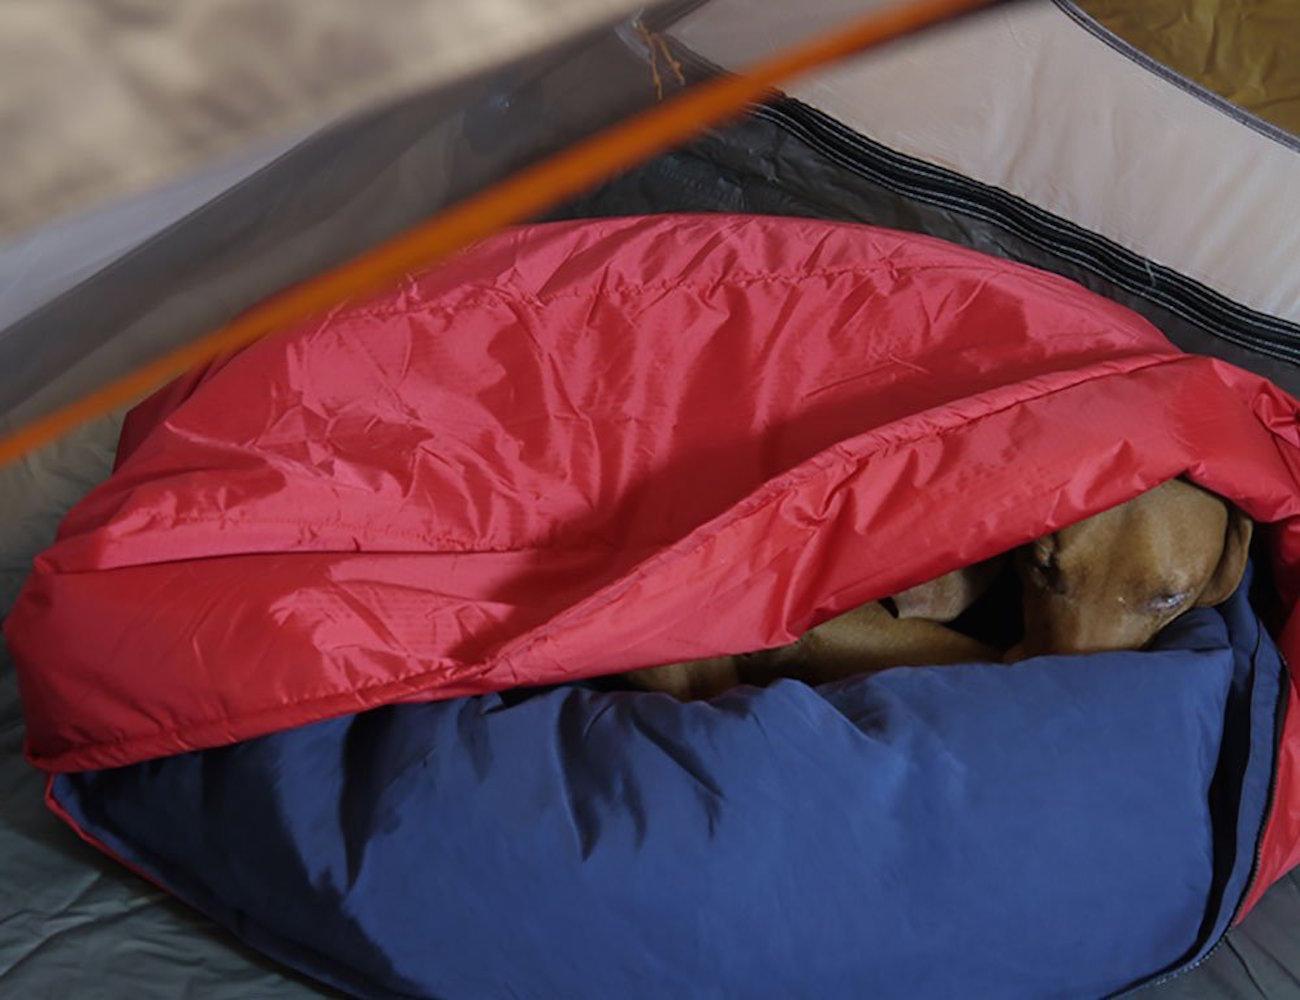 Noblecamper+2-in-1+Ultralight+Travel+Dog+Bed+And+Sleeping+Bag